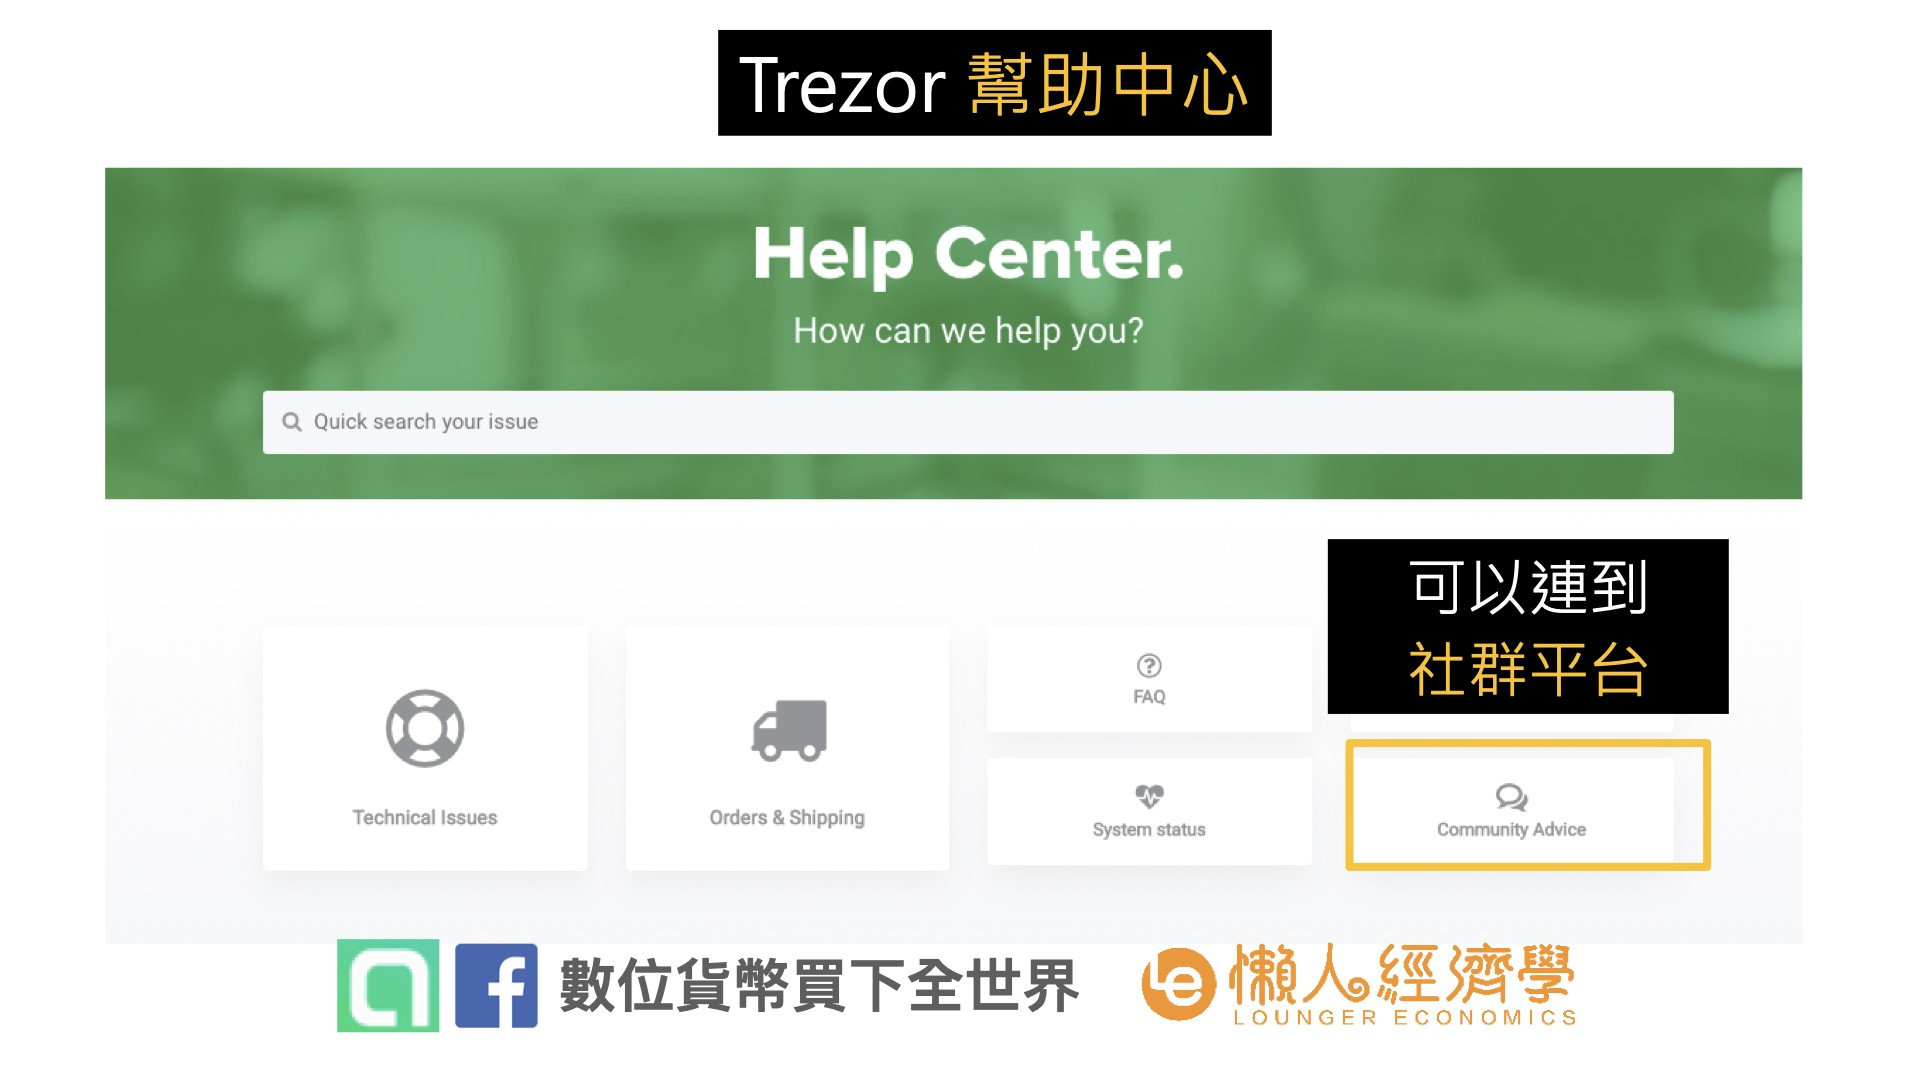 Trezor 客服:Trezor幫助中心介面